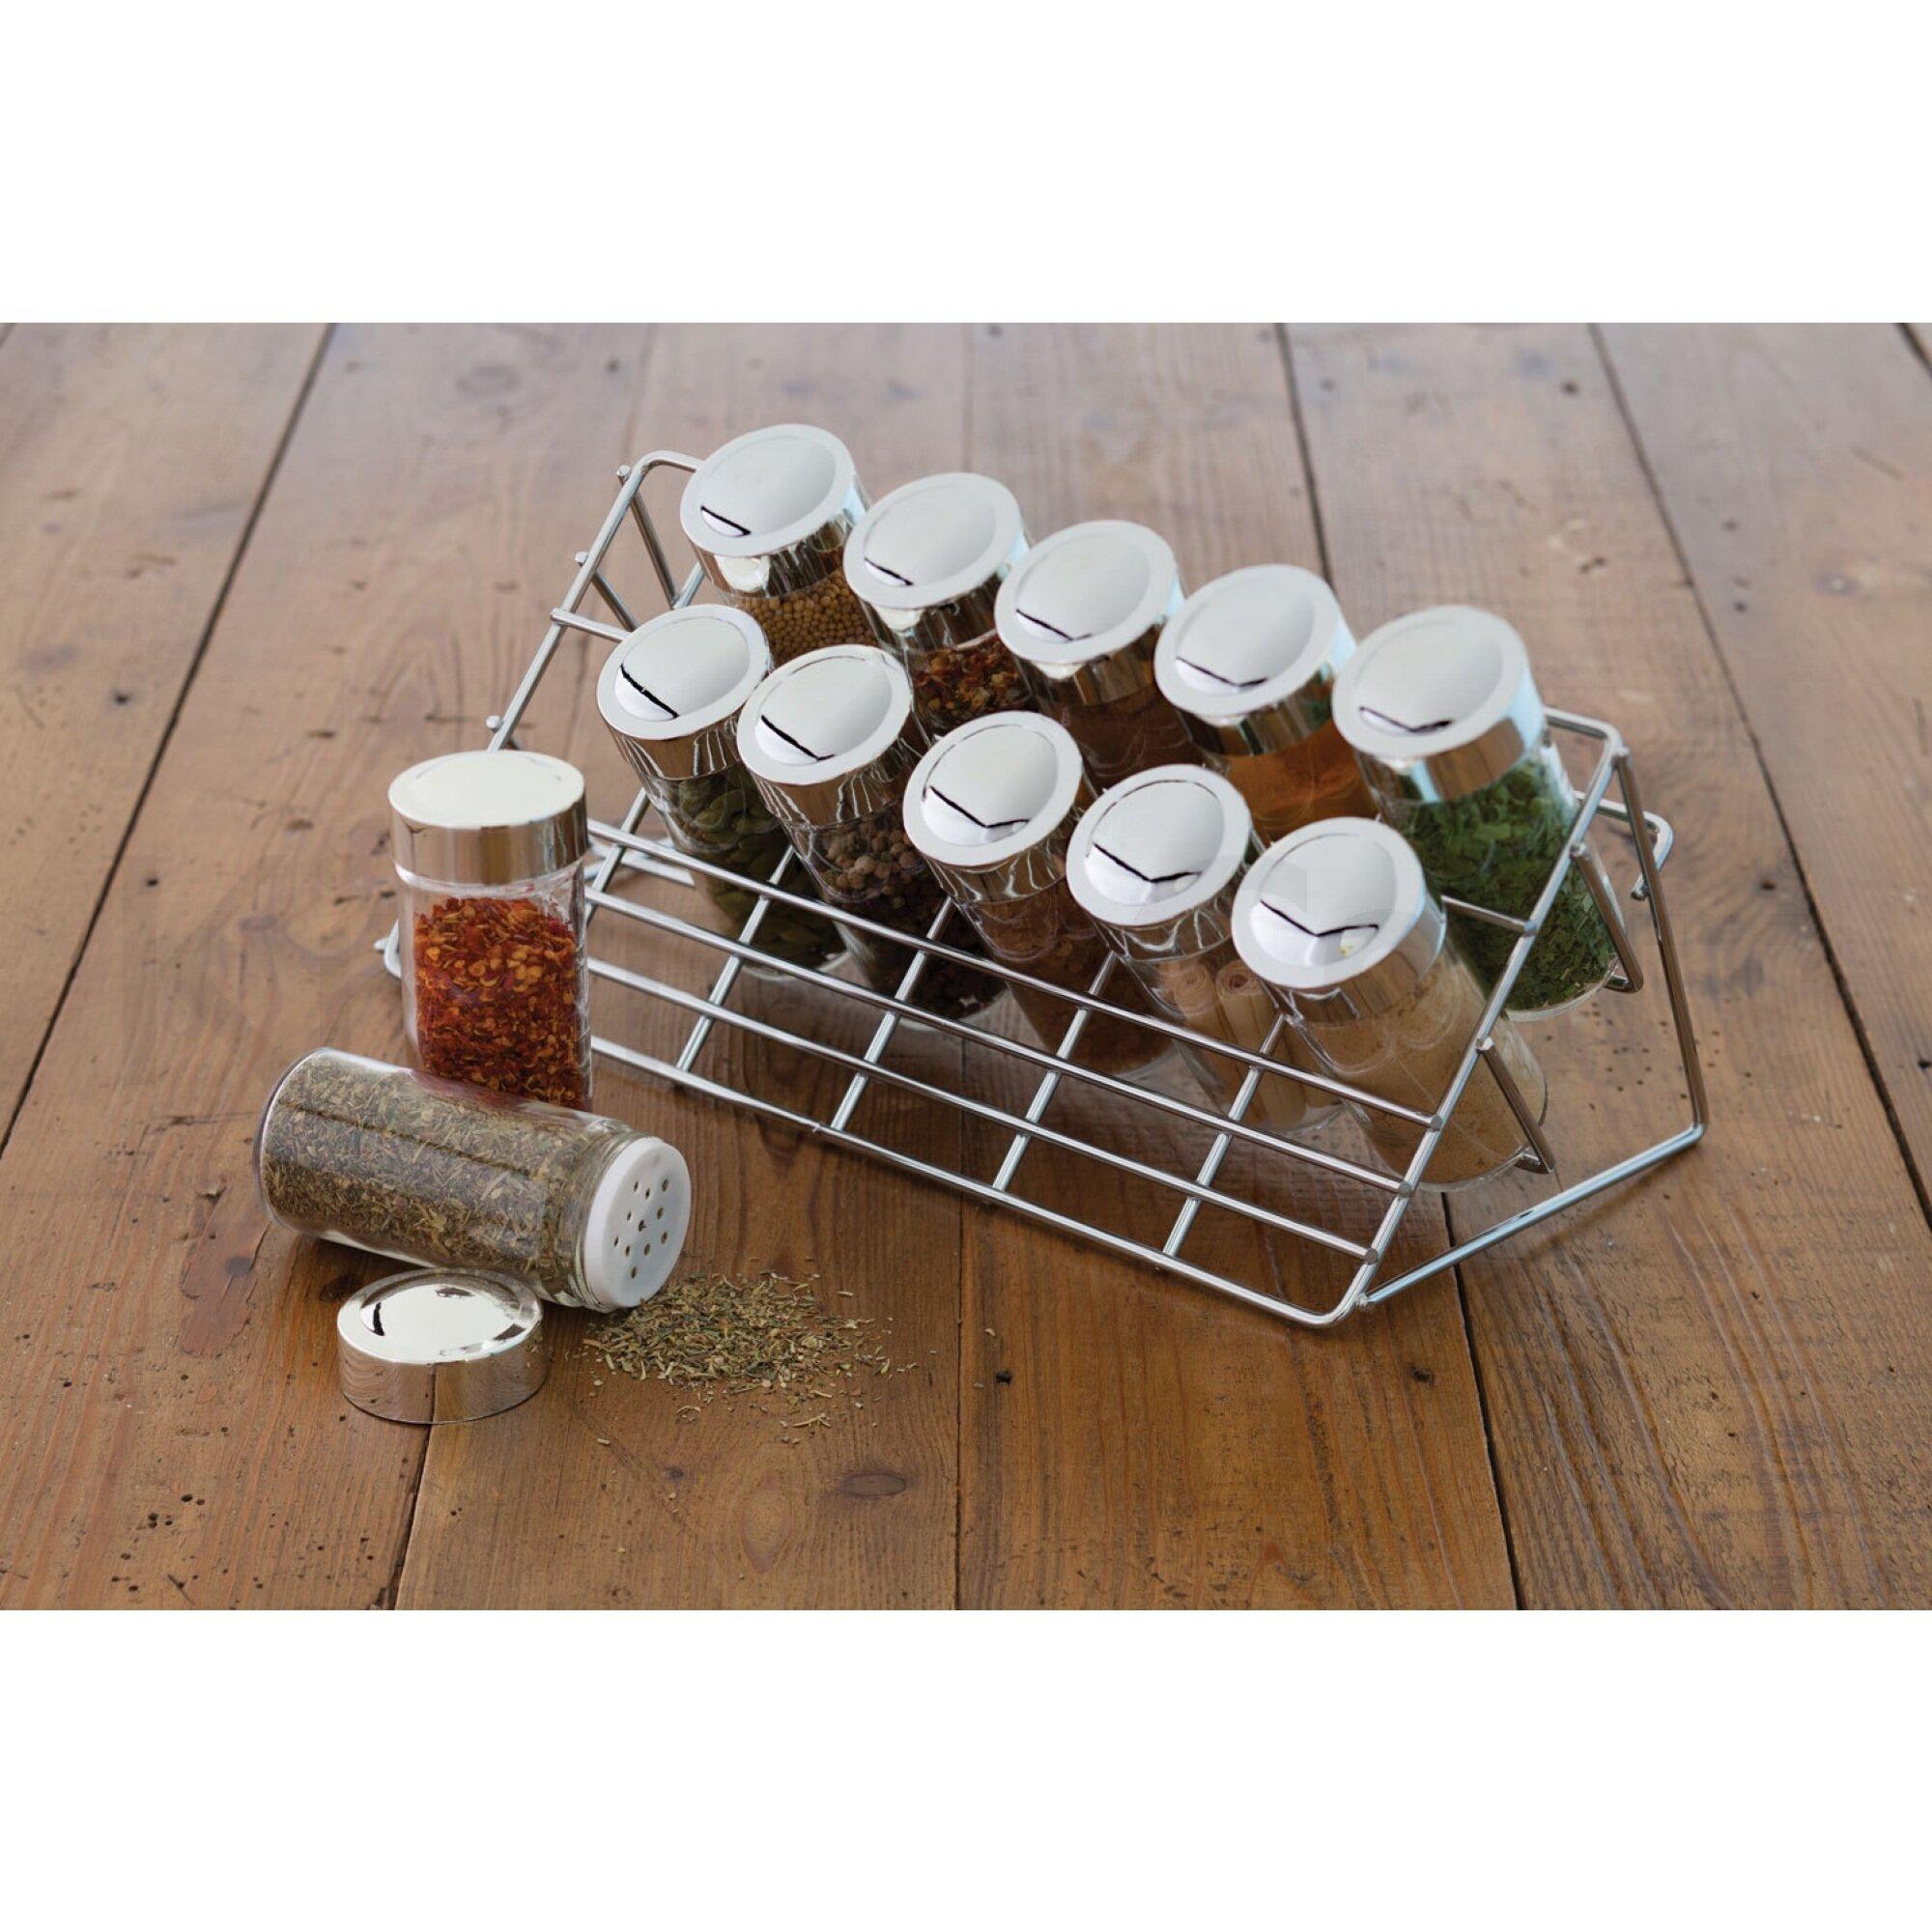 Kitchen Rack Set: Kitchen Craft Chrome Plated 13 Piece Spice Rack Set